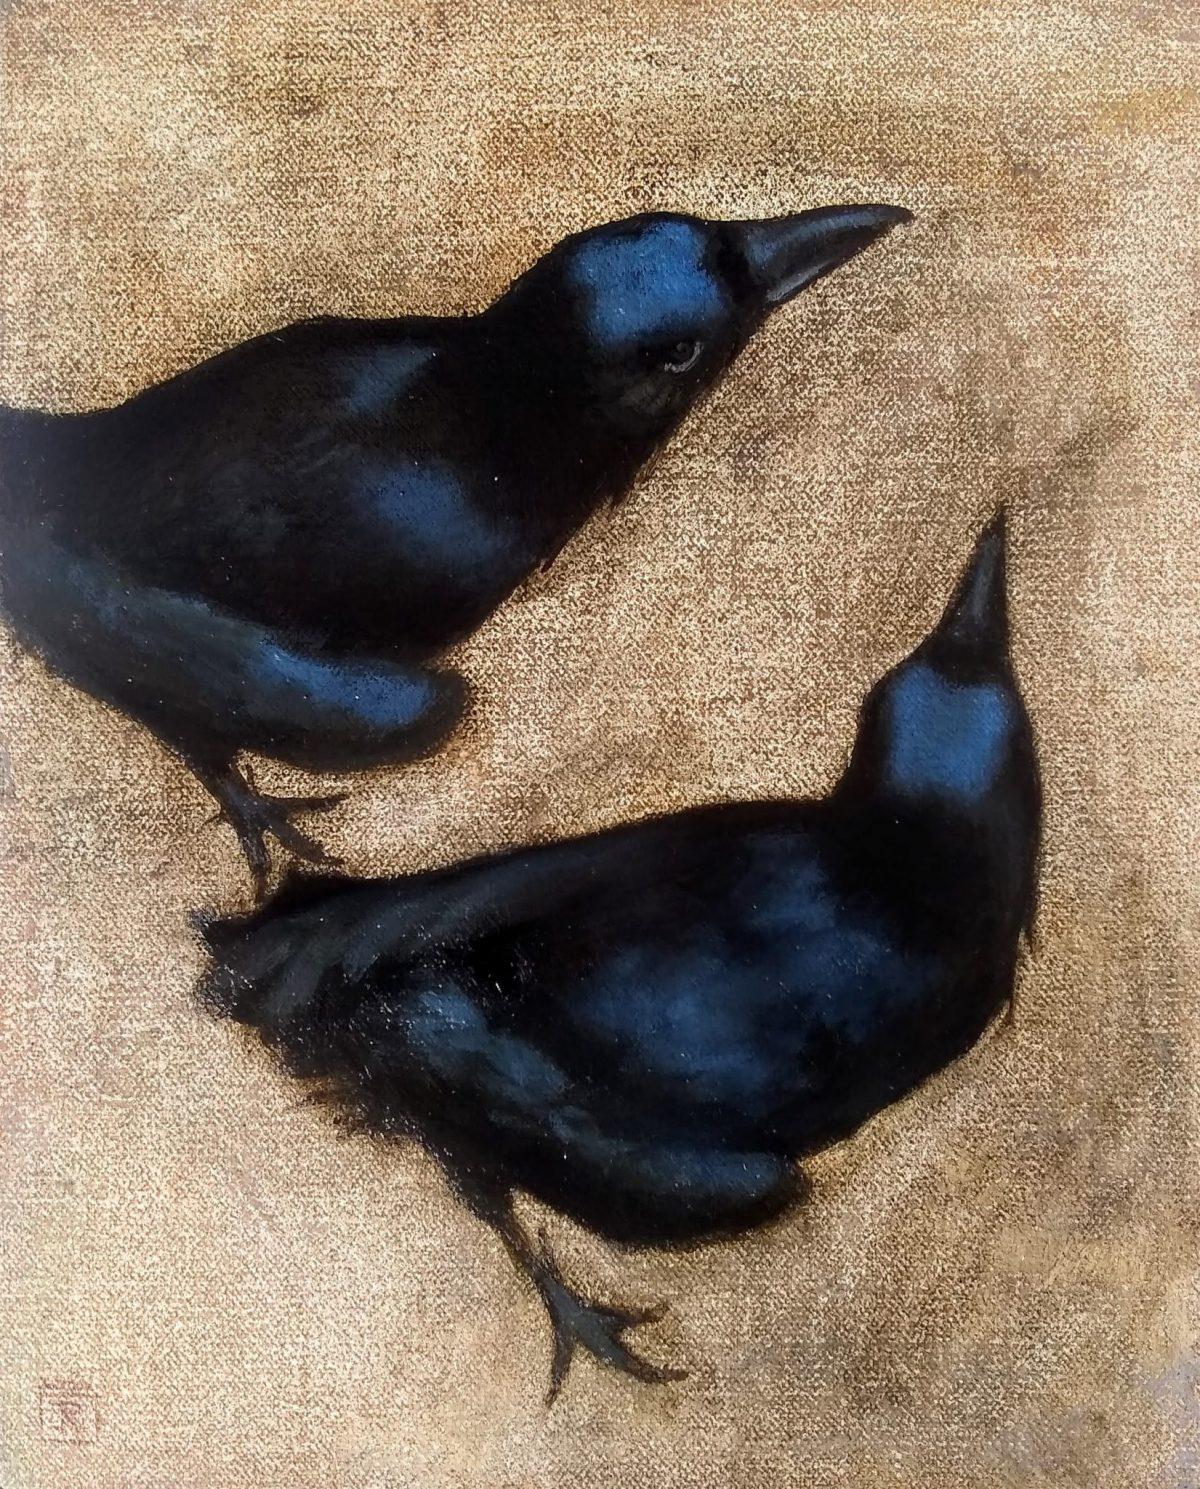 Twa Corbies, Rebecca King Hawkinson